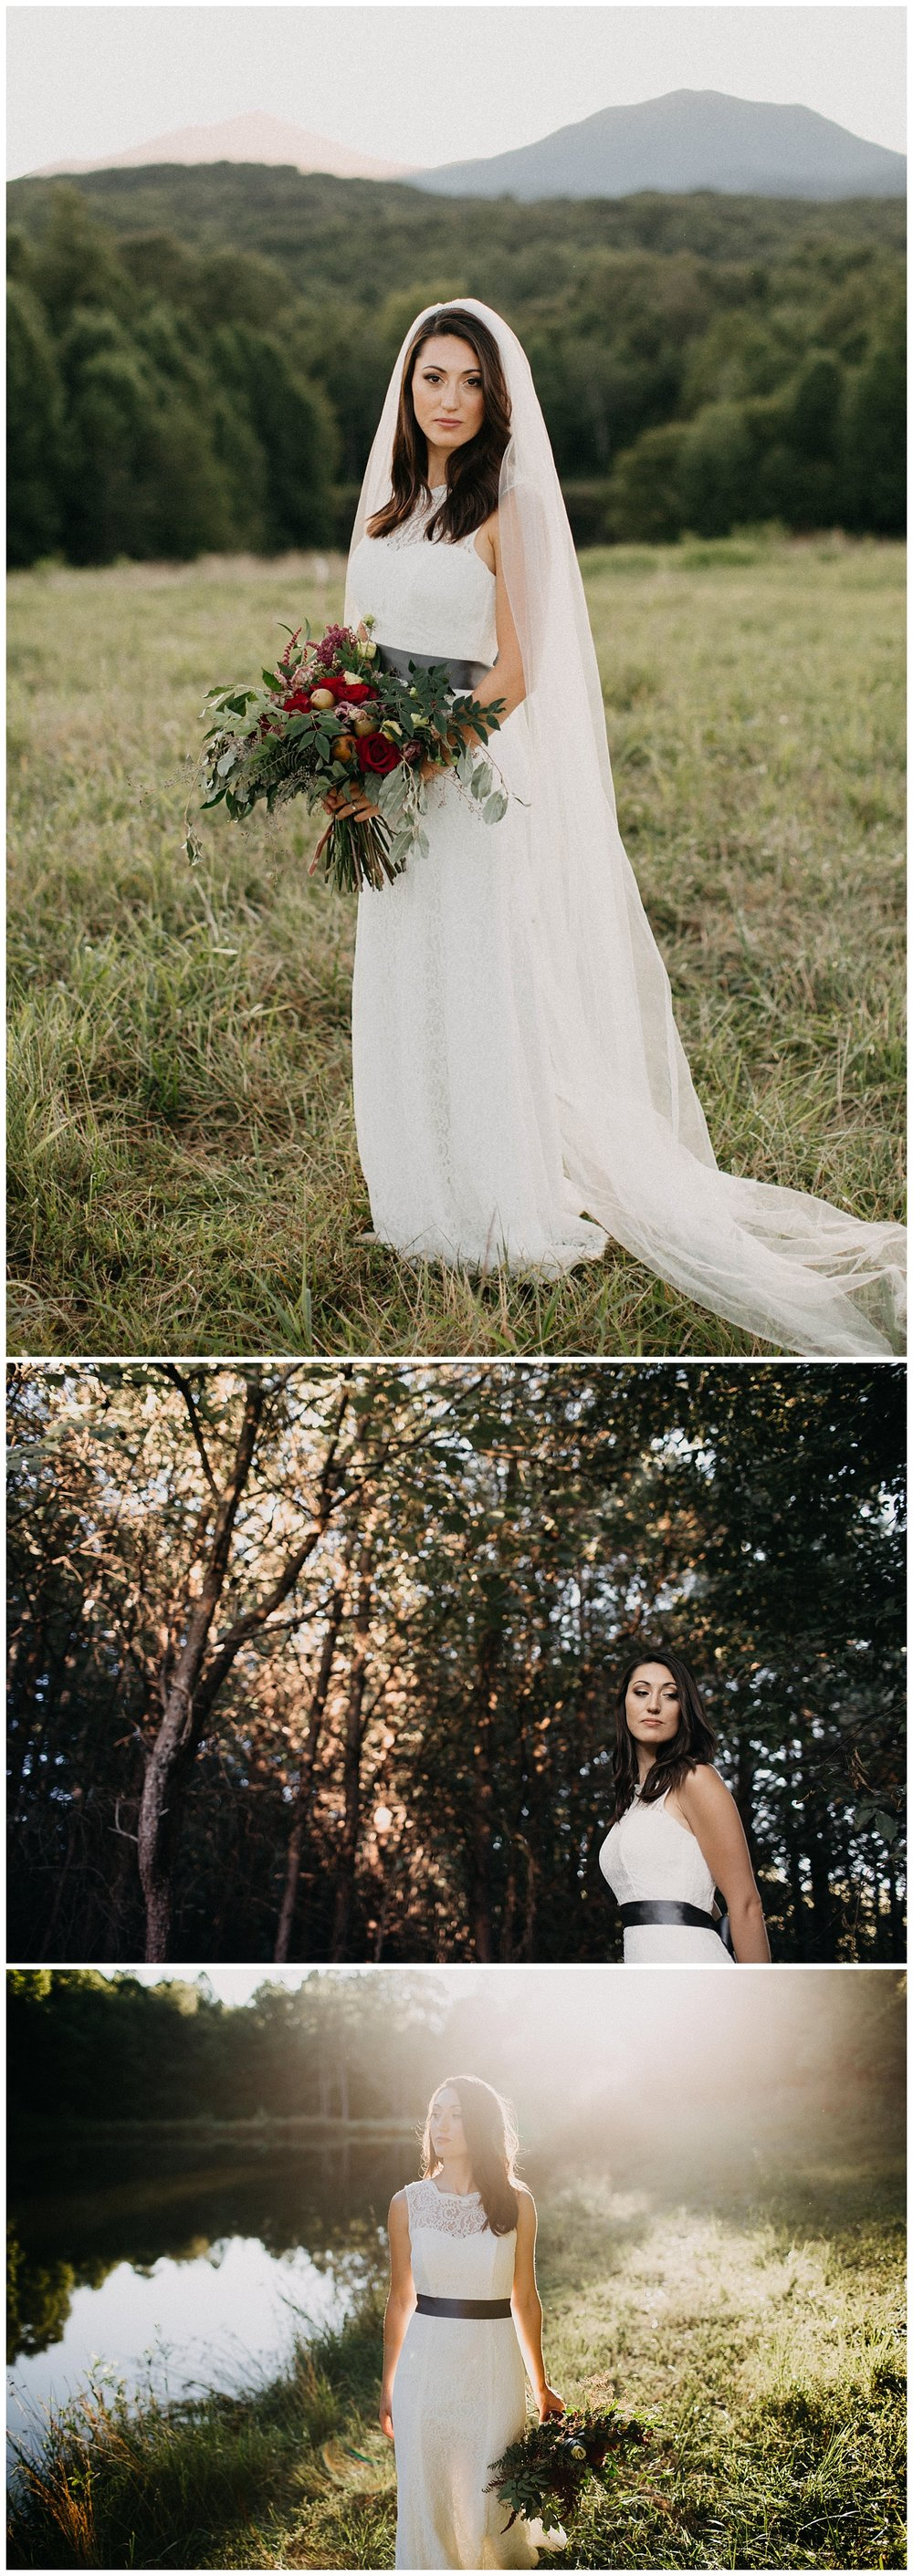 Bridal Photographer in Goode, Virginia